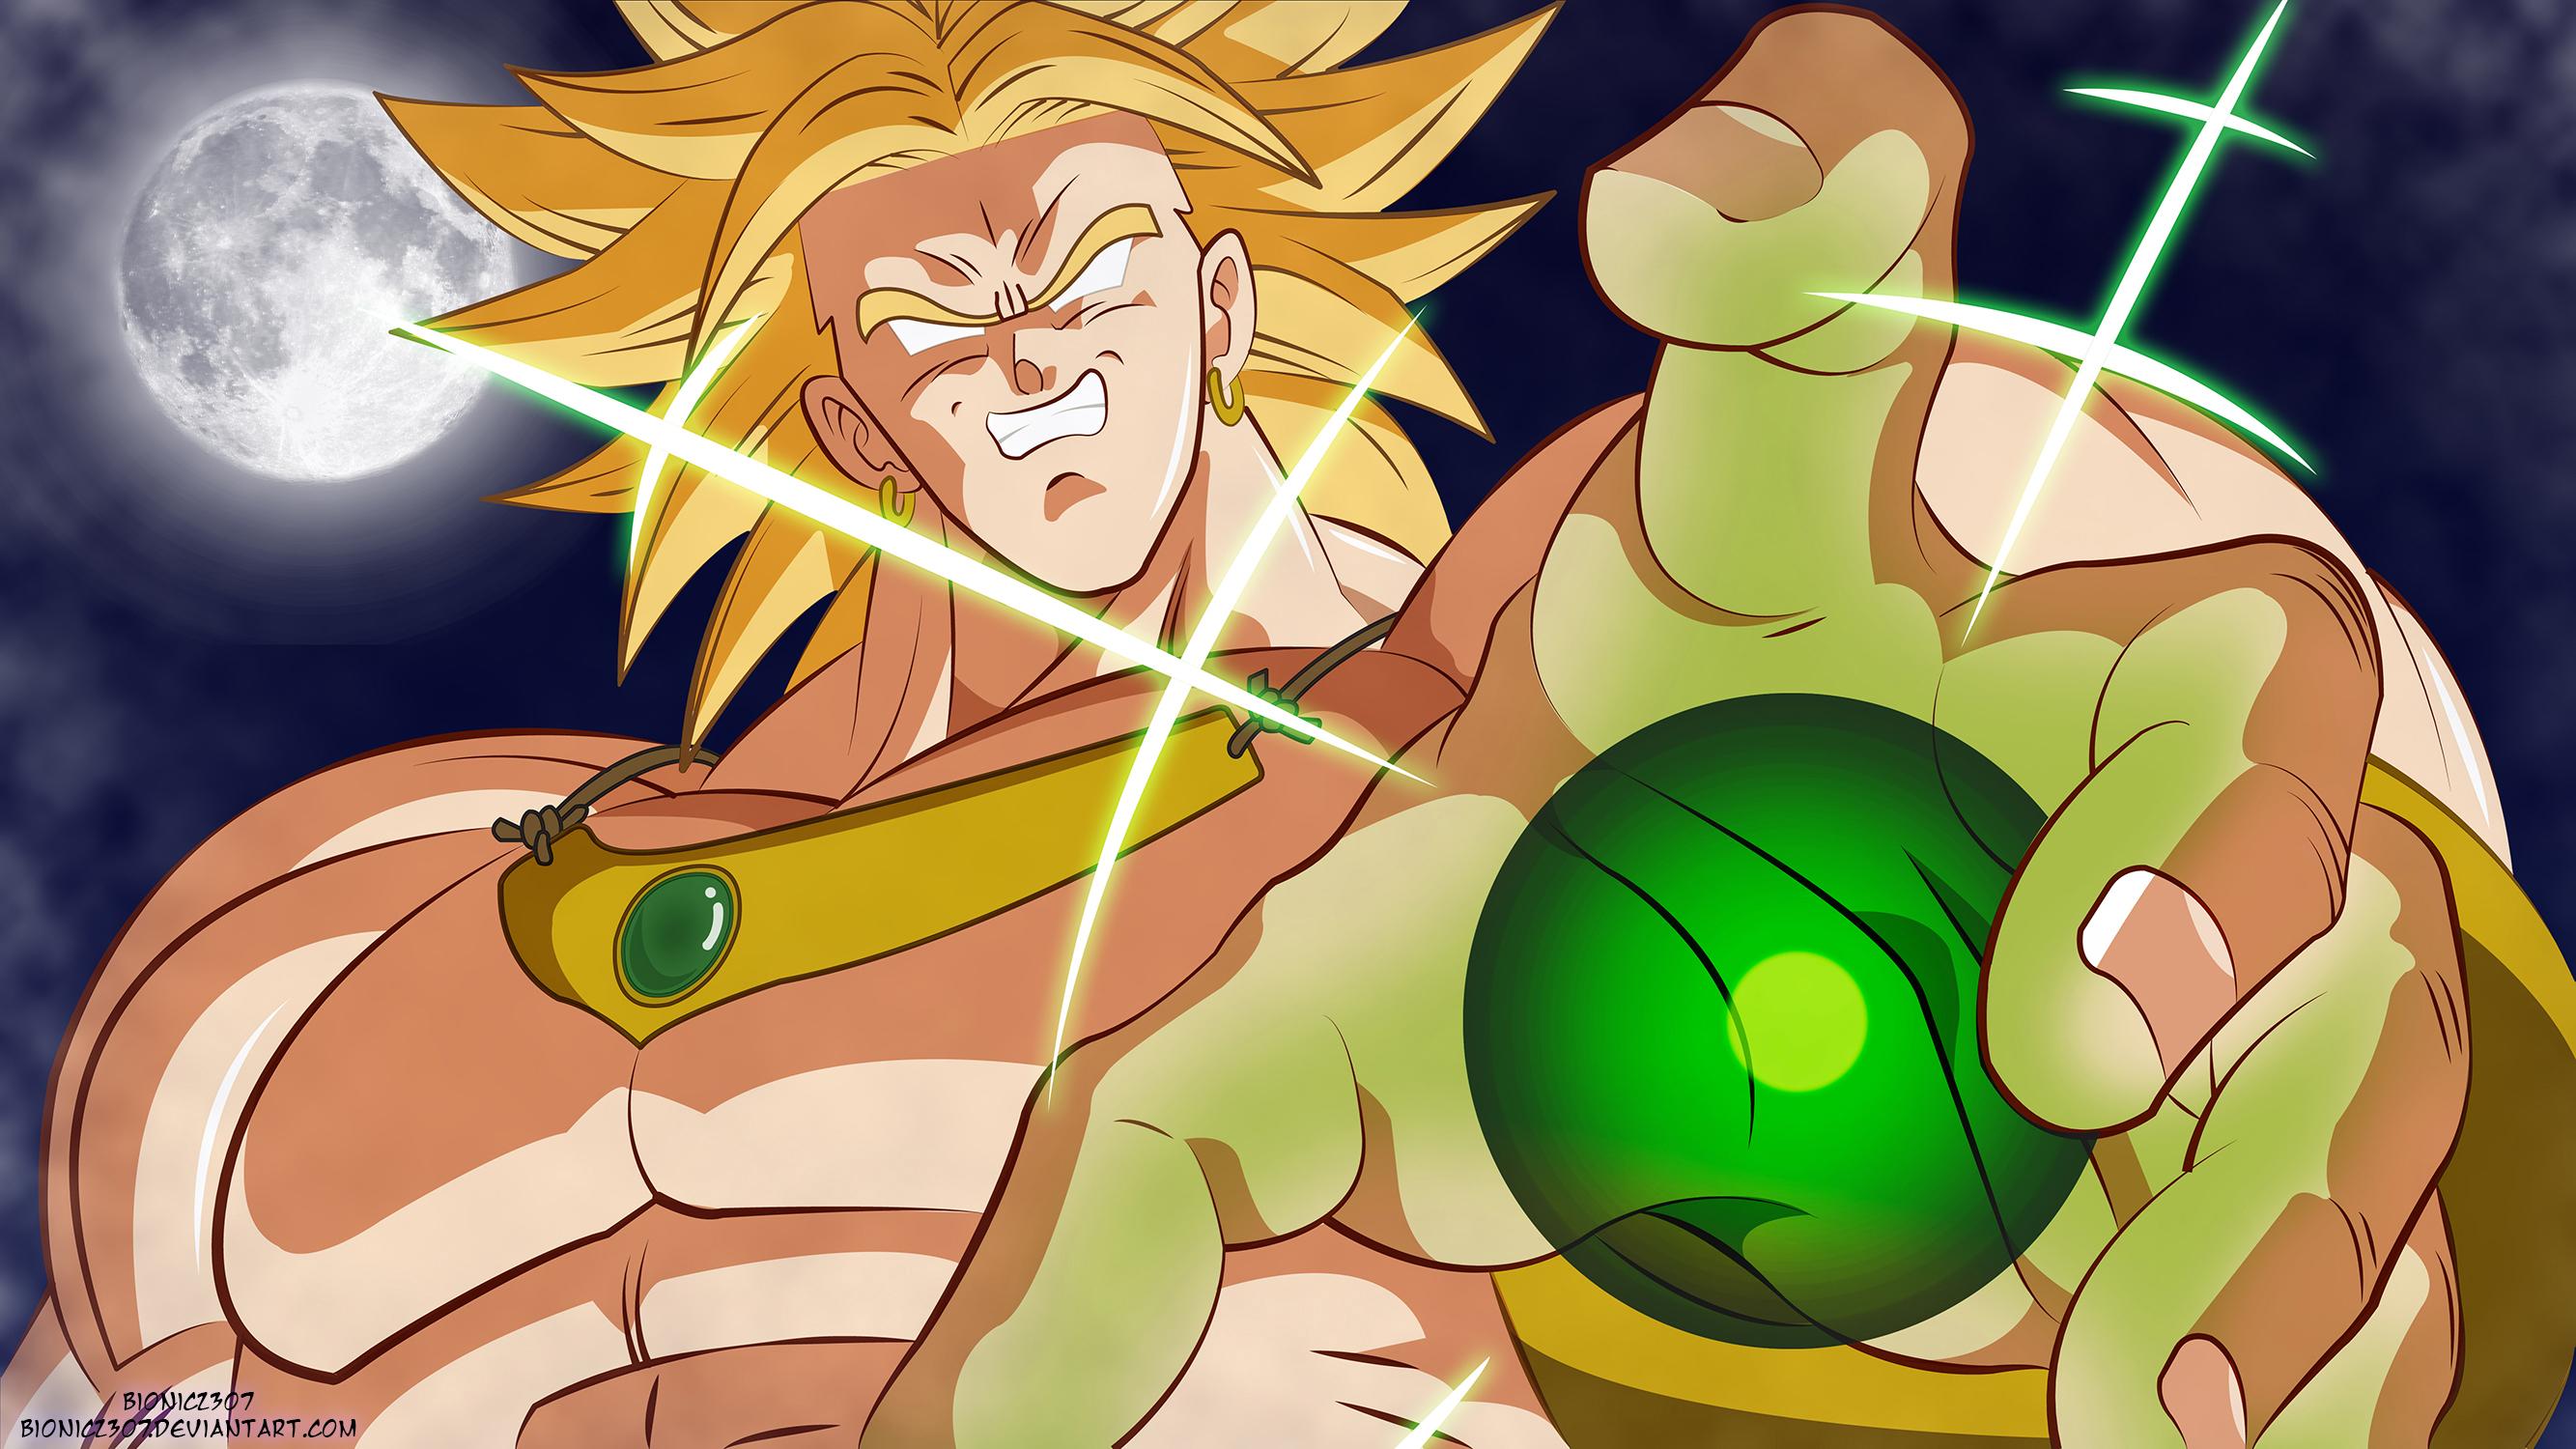 Broly The Legendary Super Saiyan By Bionic2307 On Deviantart